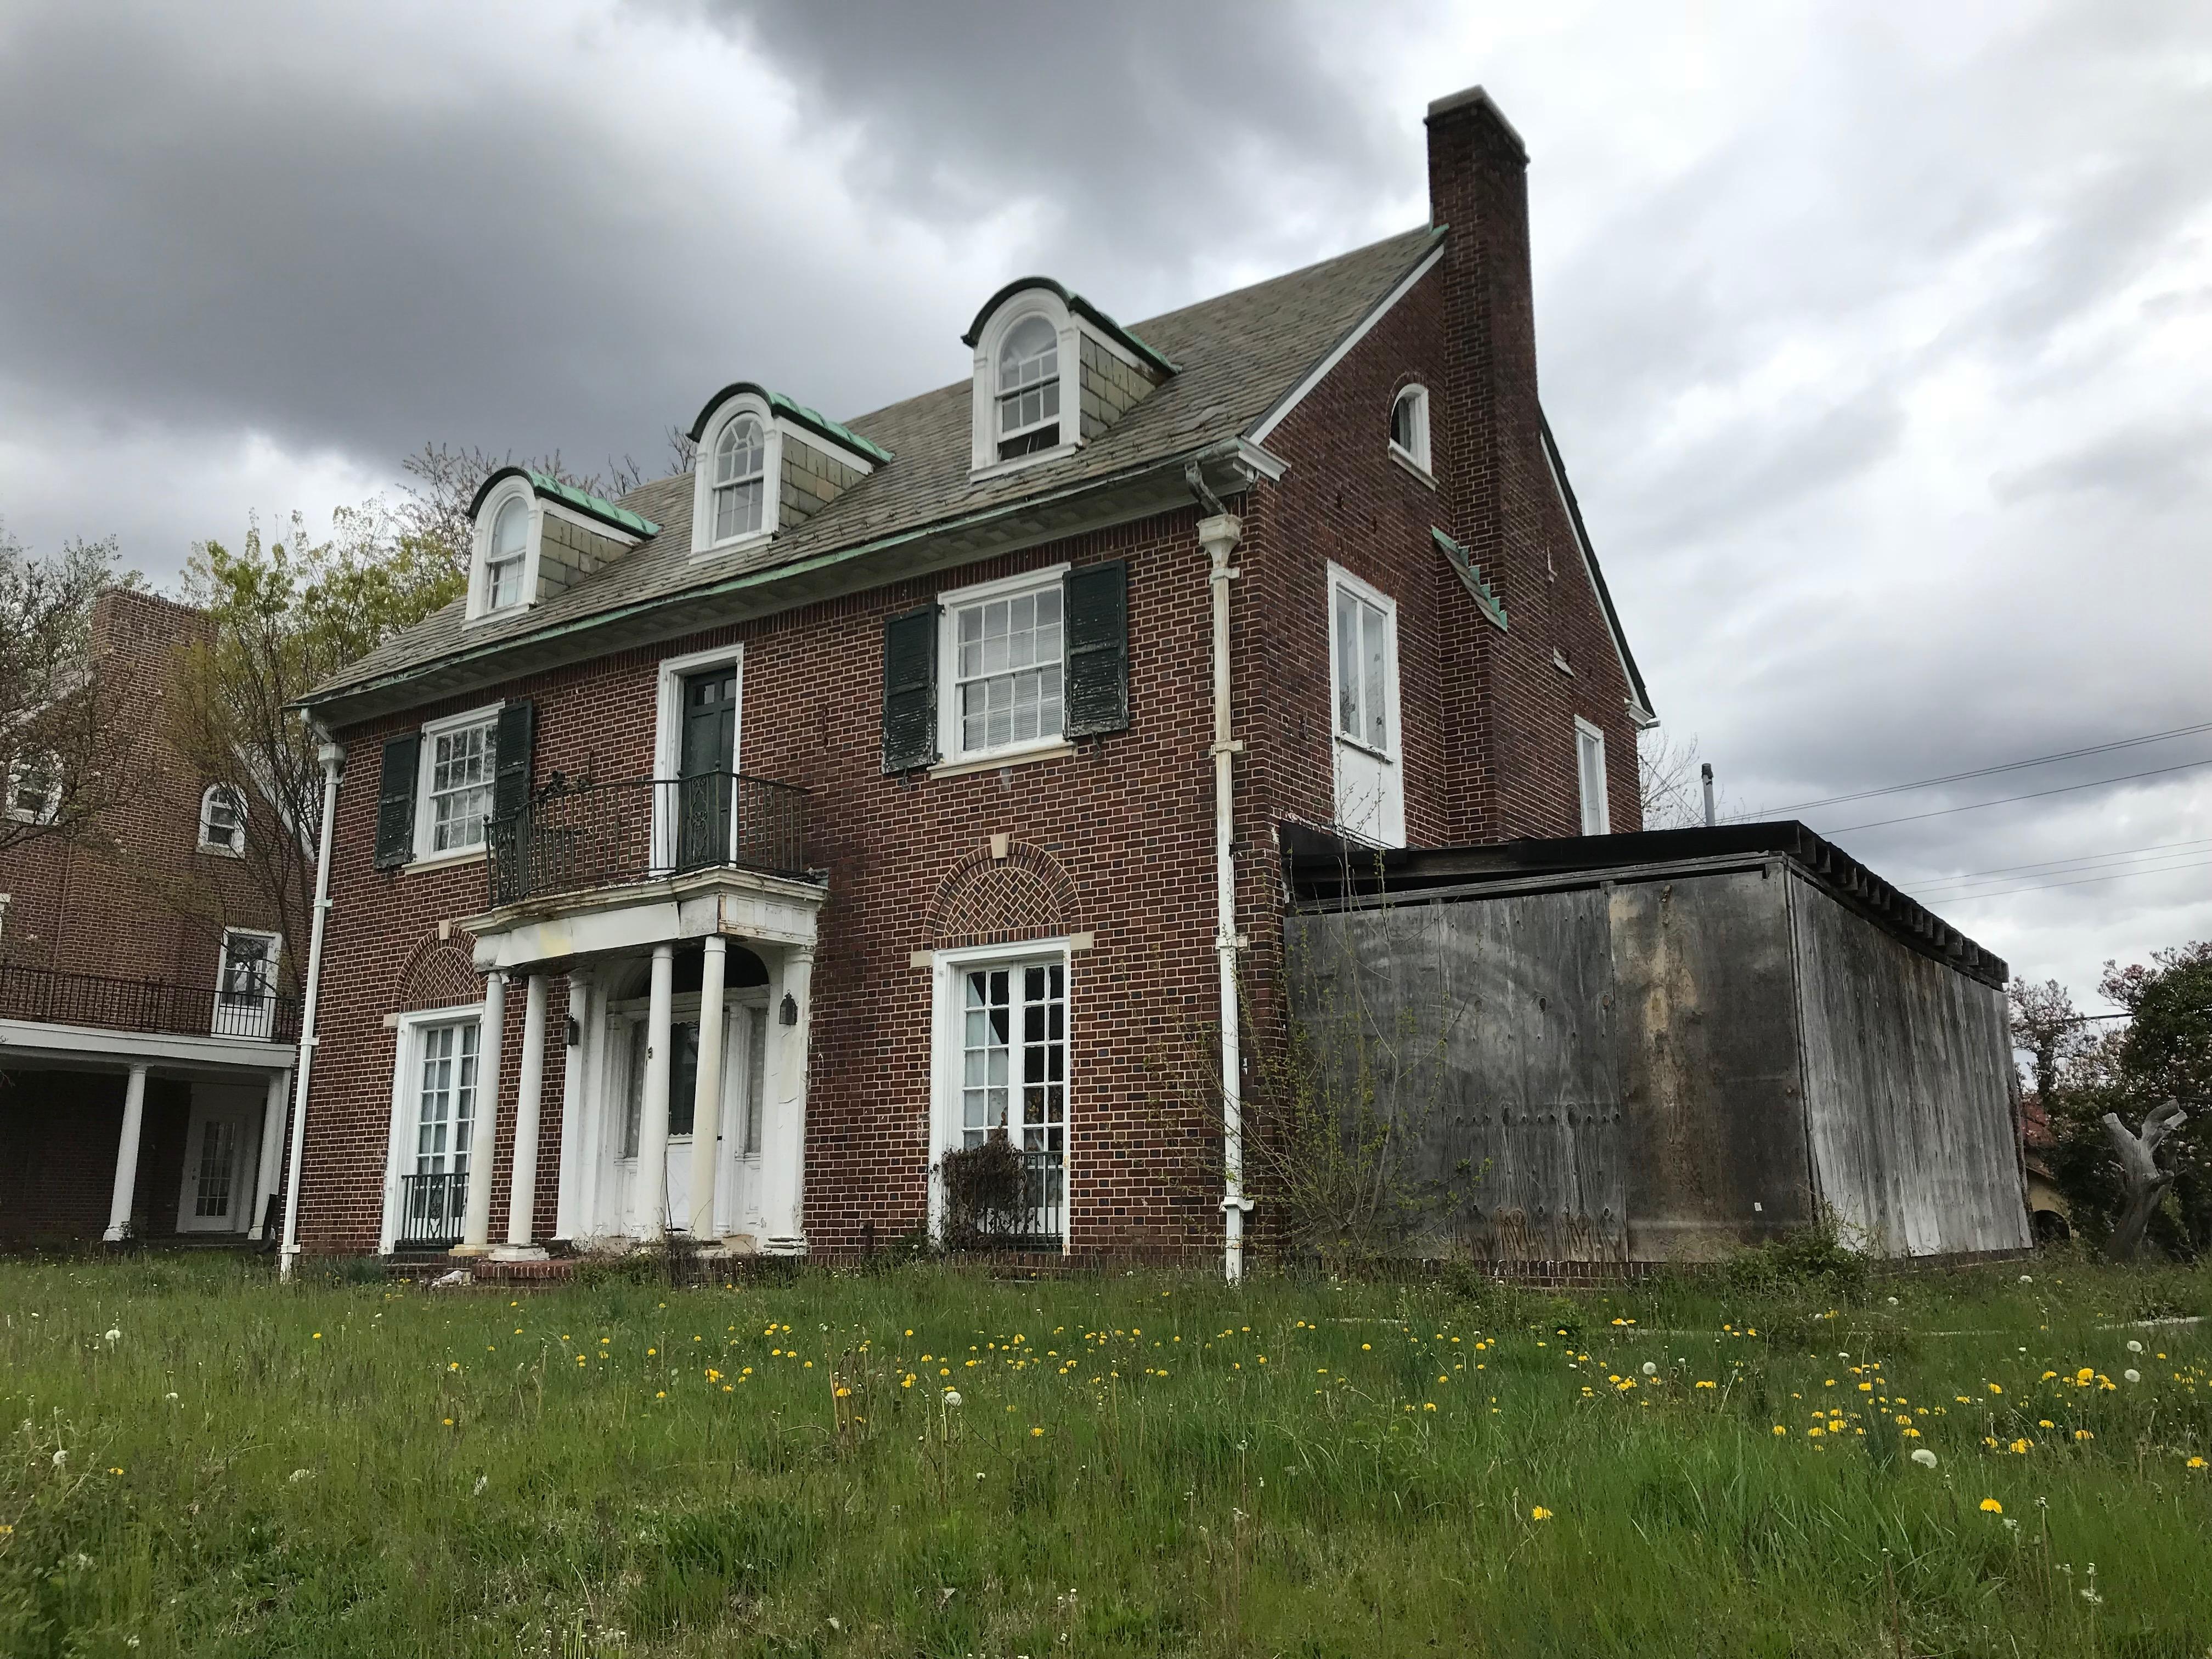 Vacant house, e. 33rd street and tivoli avenue (northwest corner), baltimore, md 21218 photo